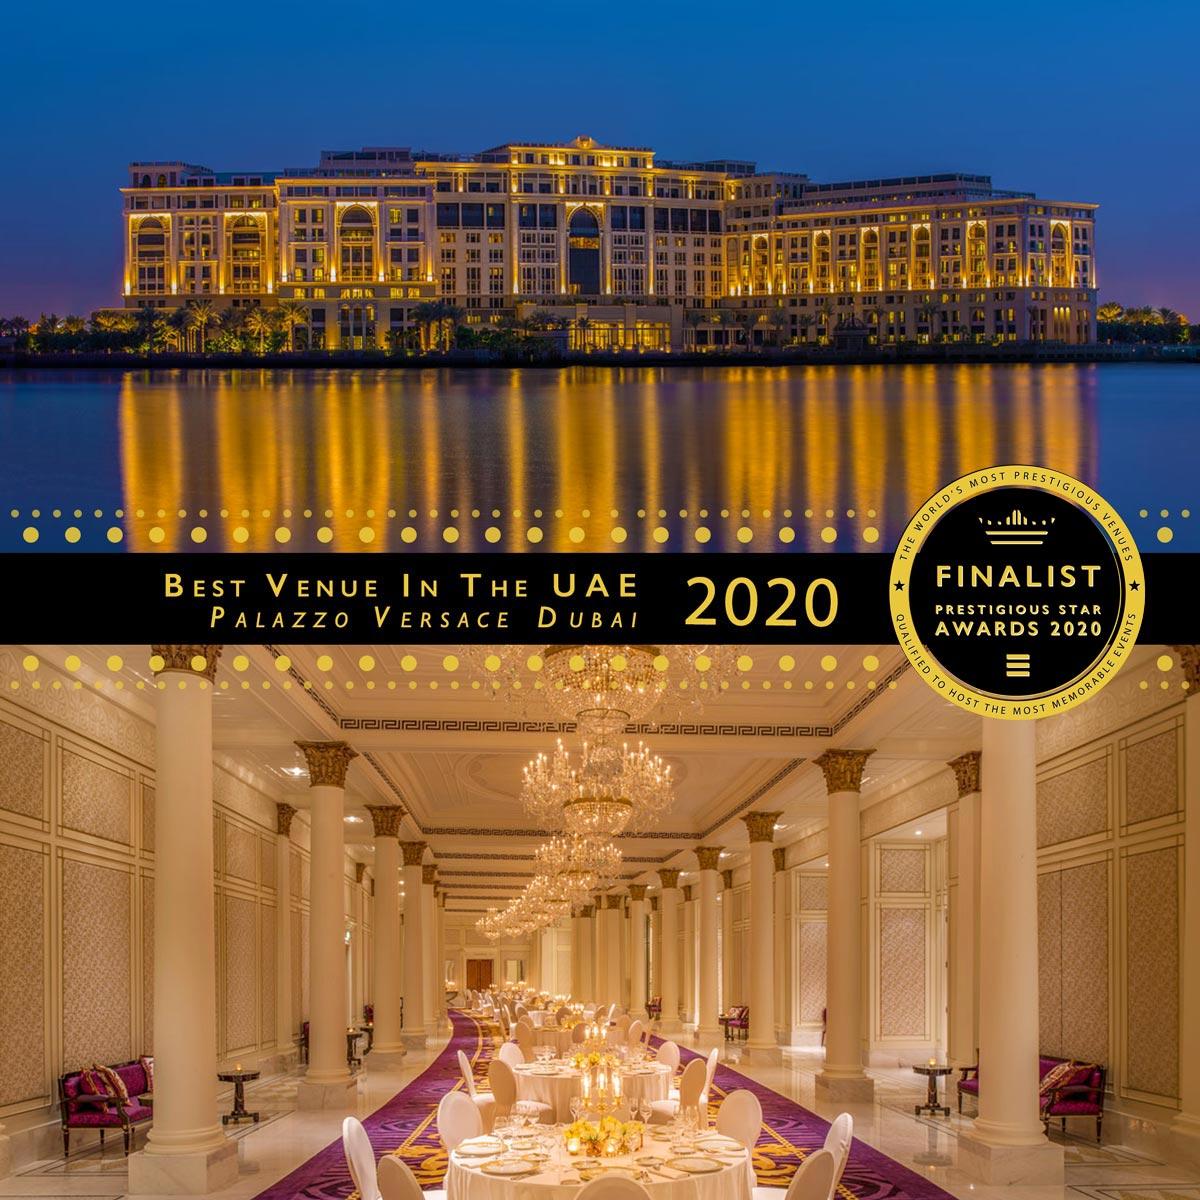 Palazzo Versace Dubai at Palazzo Versace Dubai